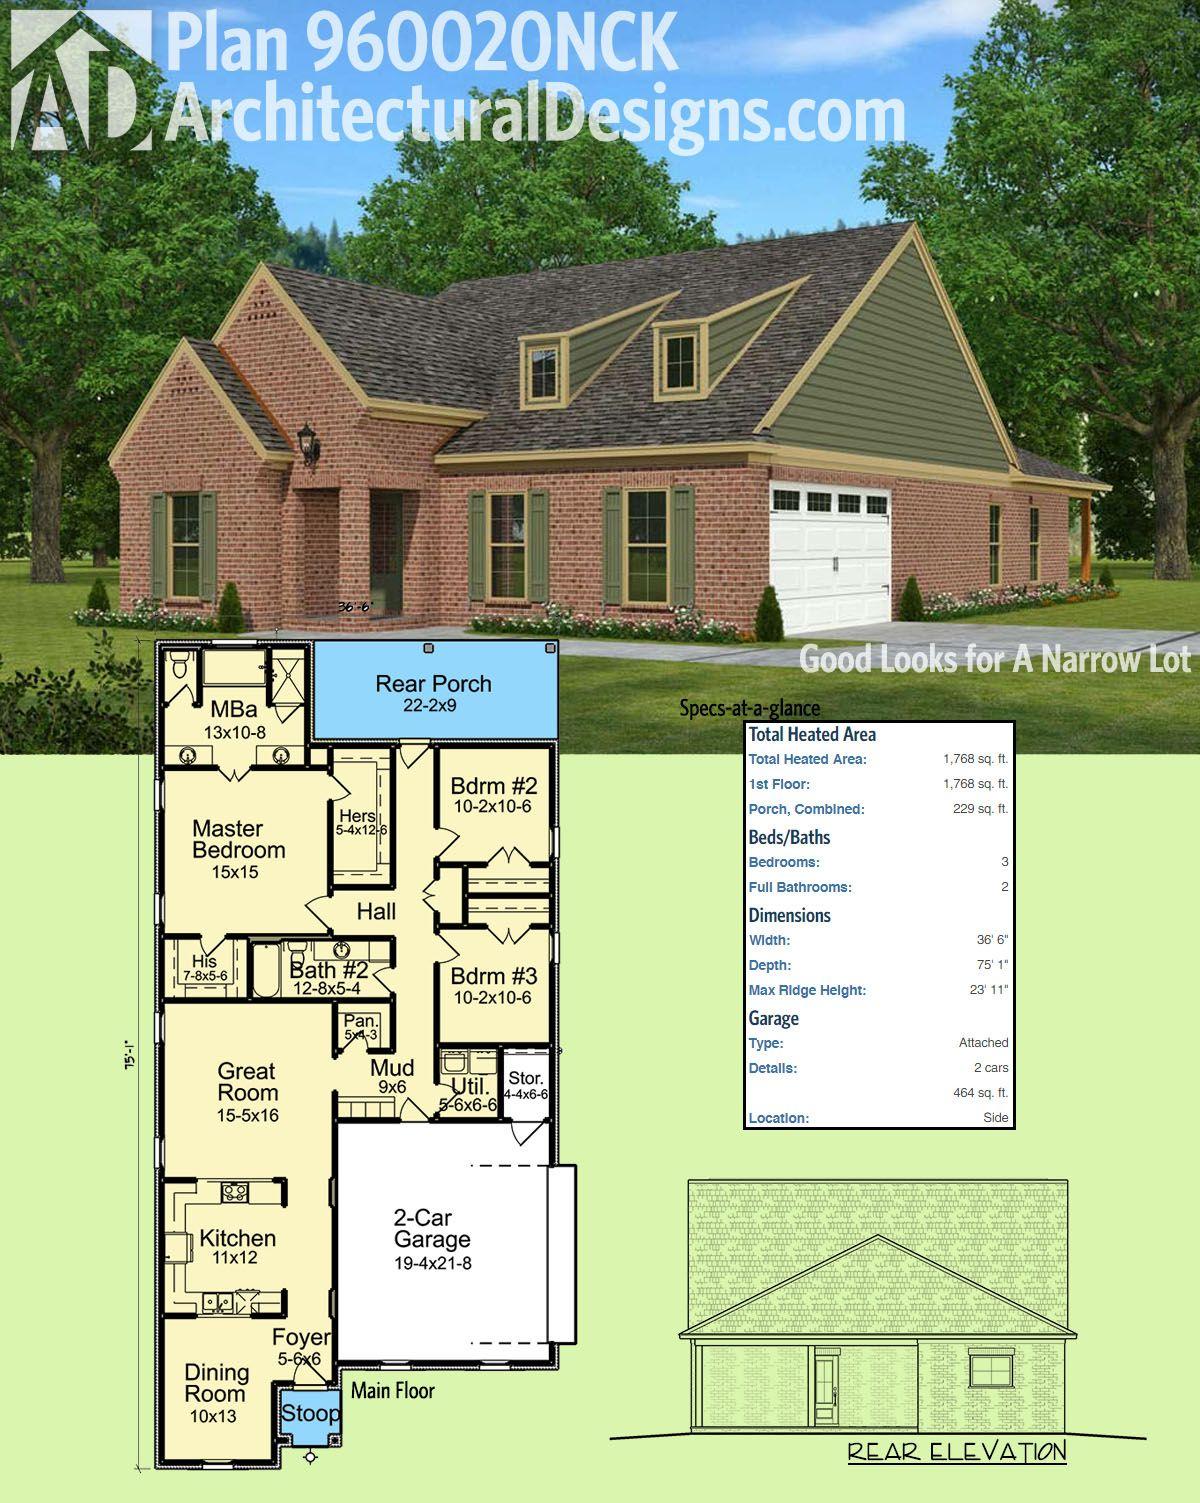 Plan 960020nck Good Looks For A Narrow Lot House Plans Architectural Design House Plans Narrow Lot House